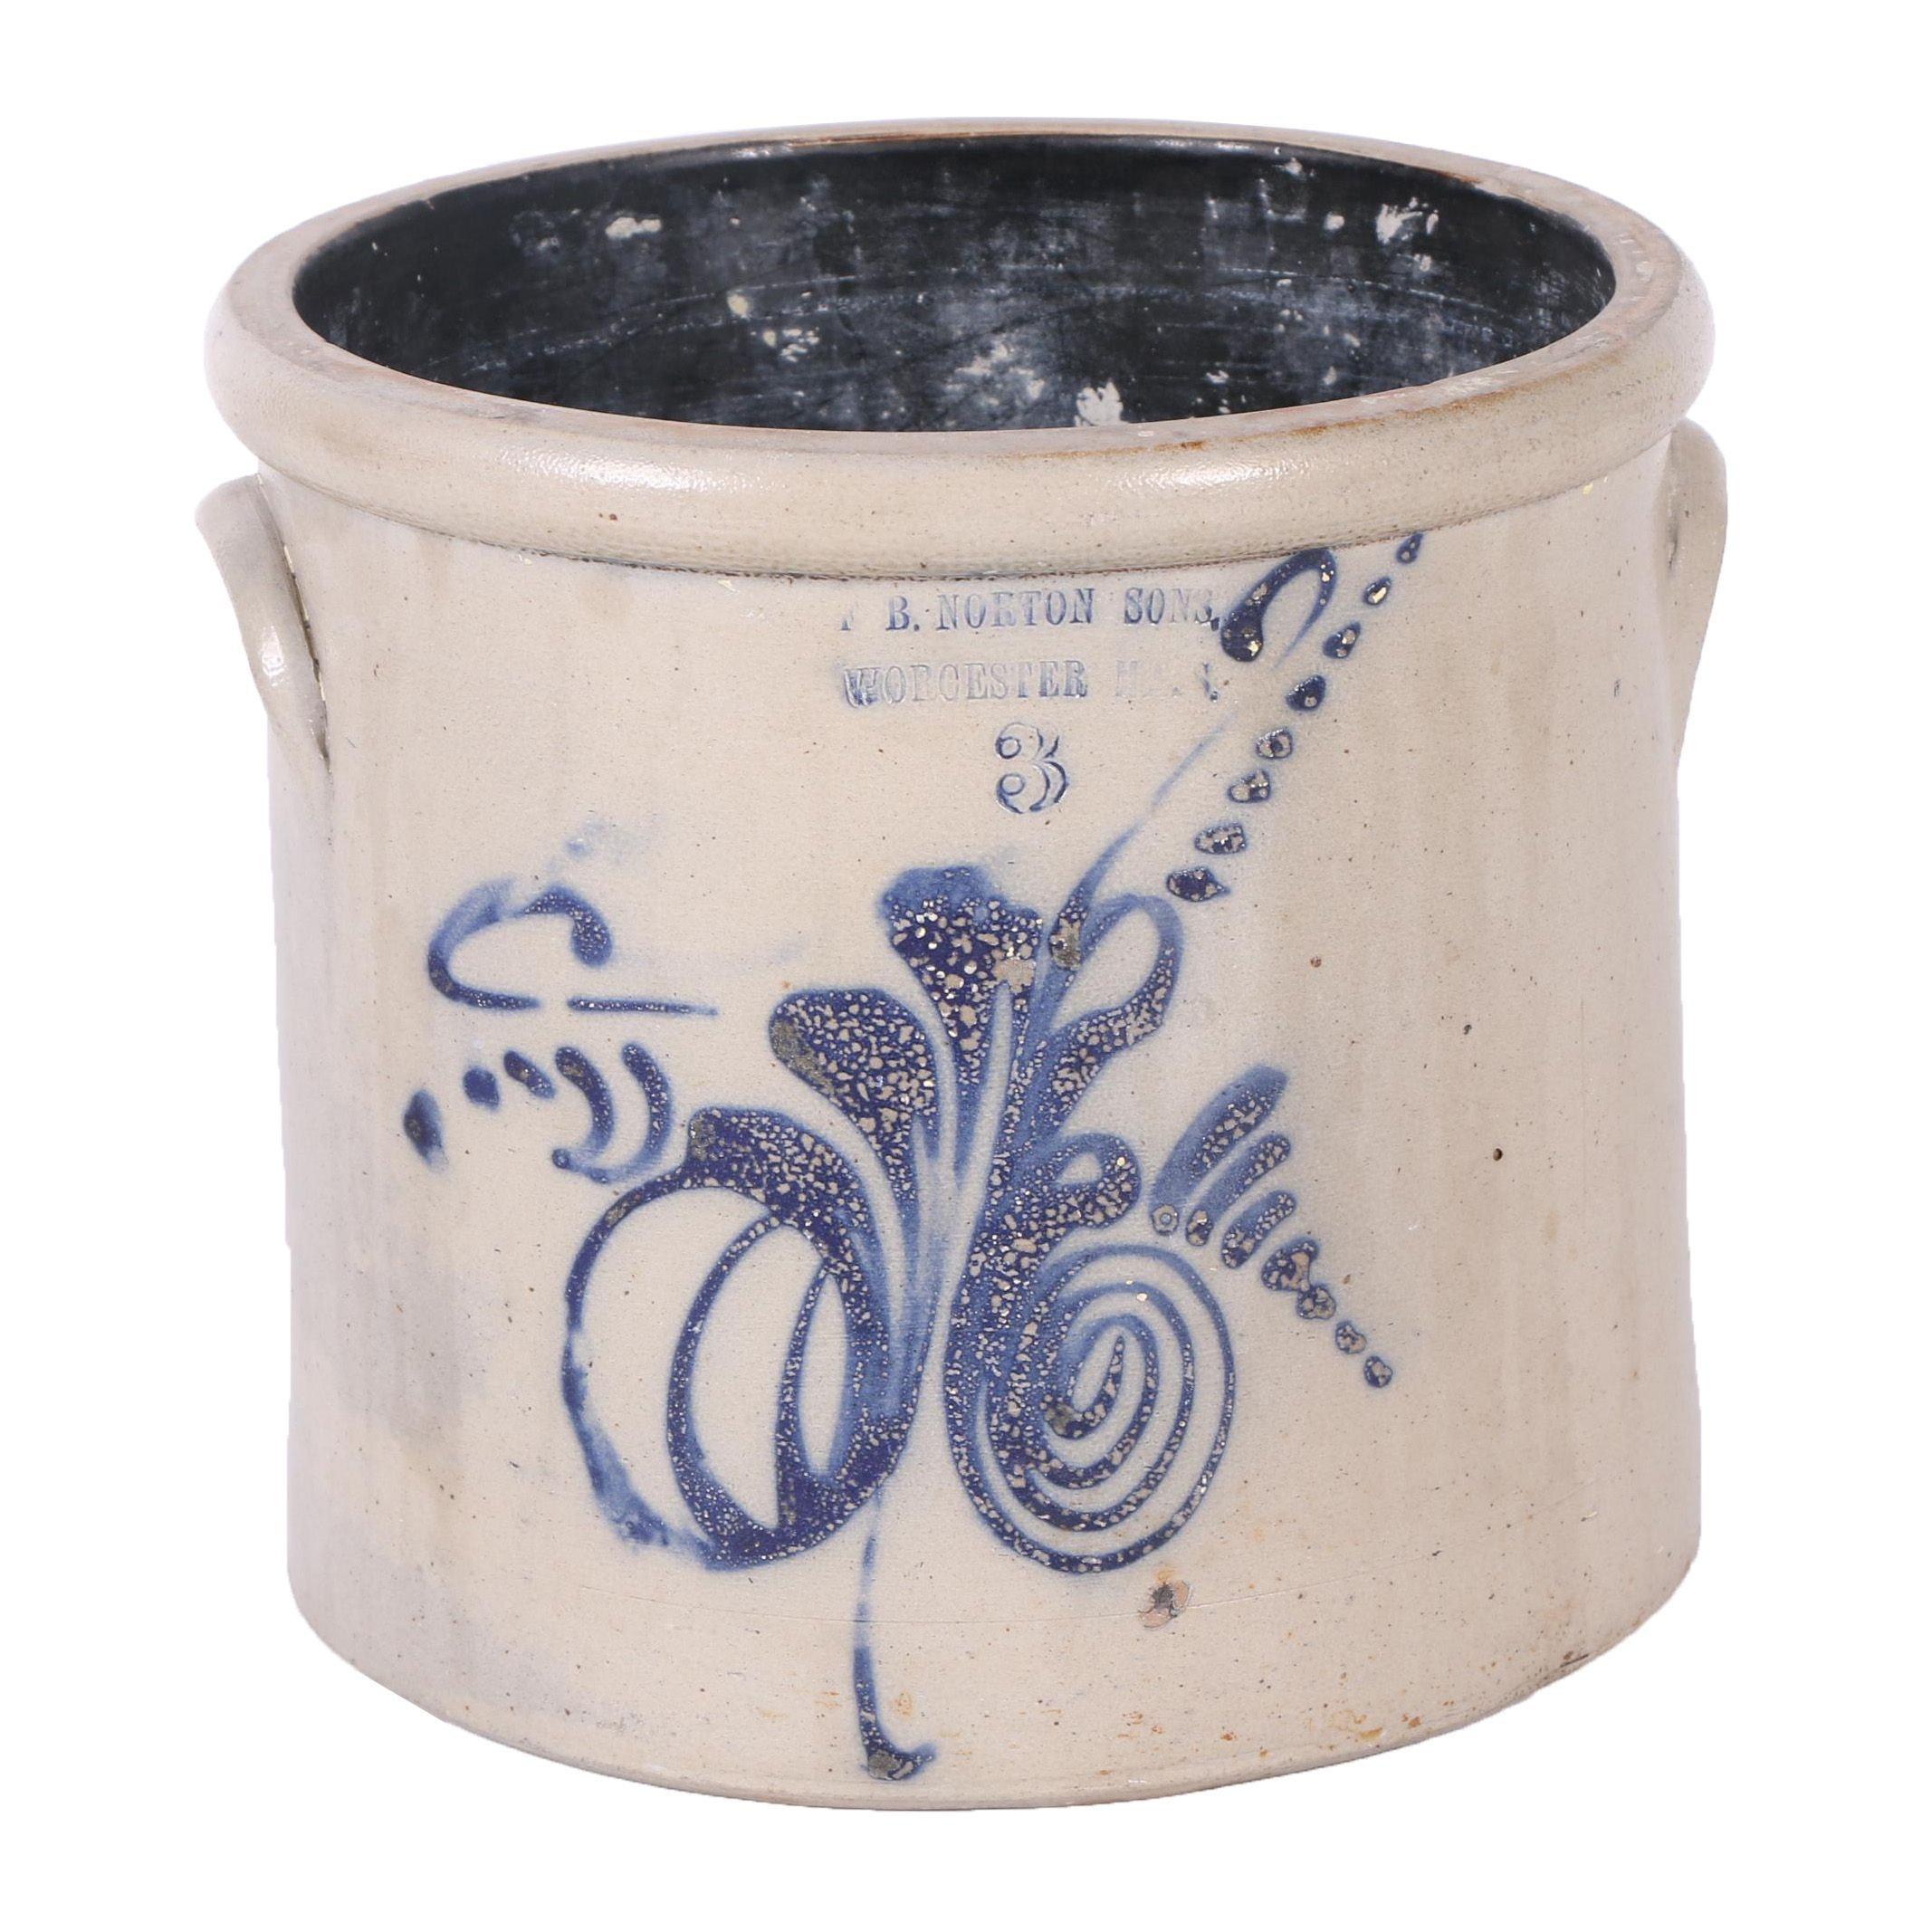 Antique F.B. Norton Sons of Worcester, MA Salt Glazed Stoneware 3-Gallon Crock